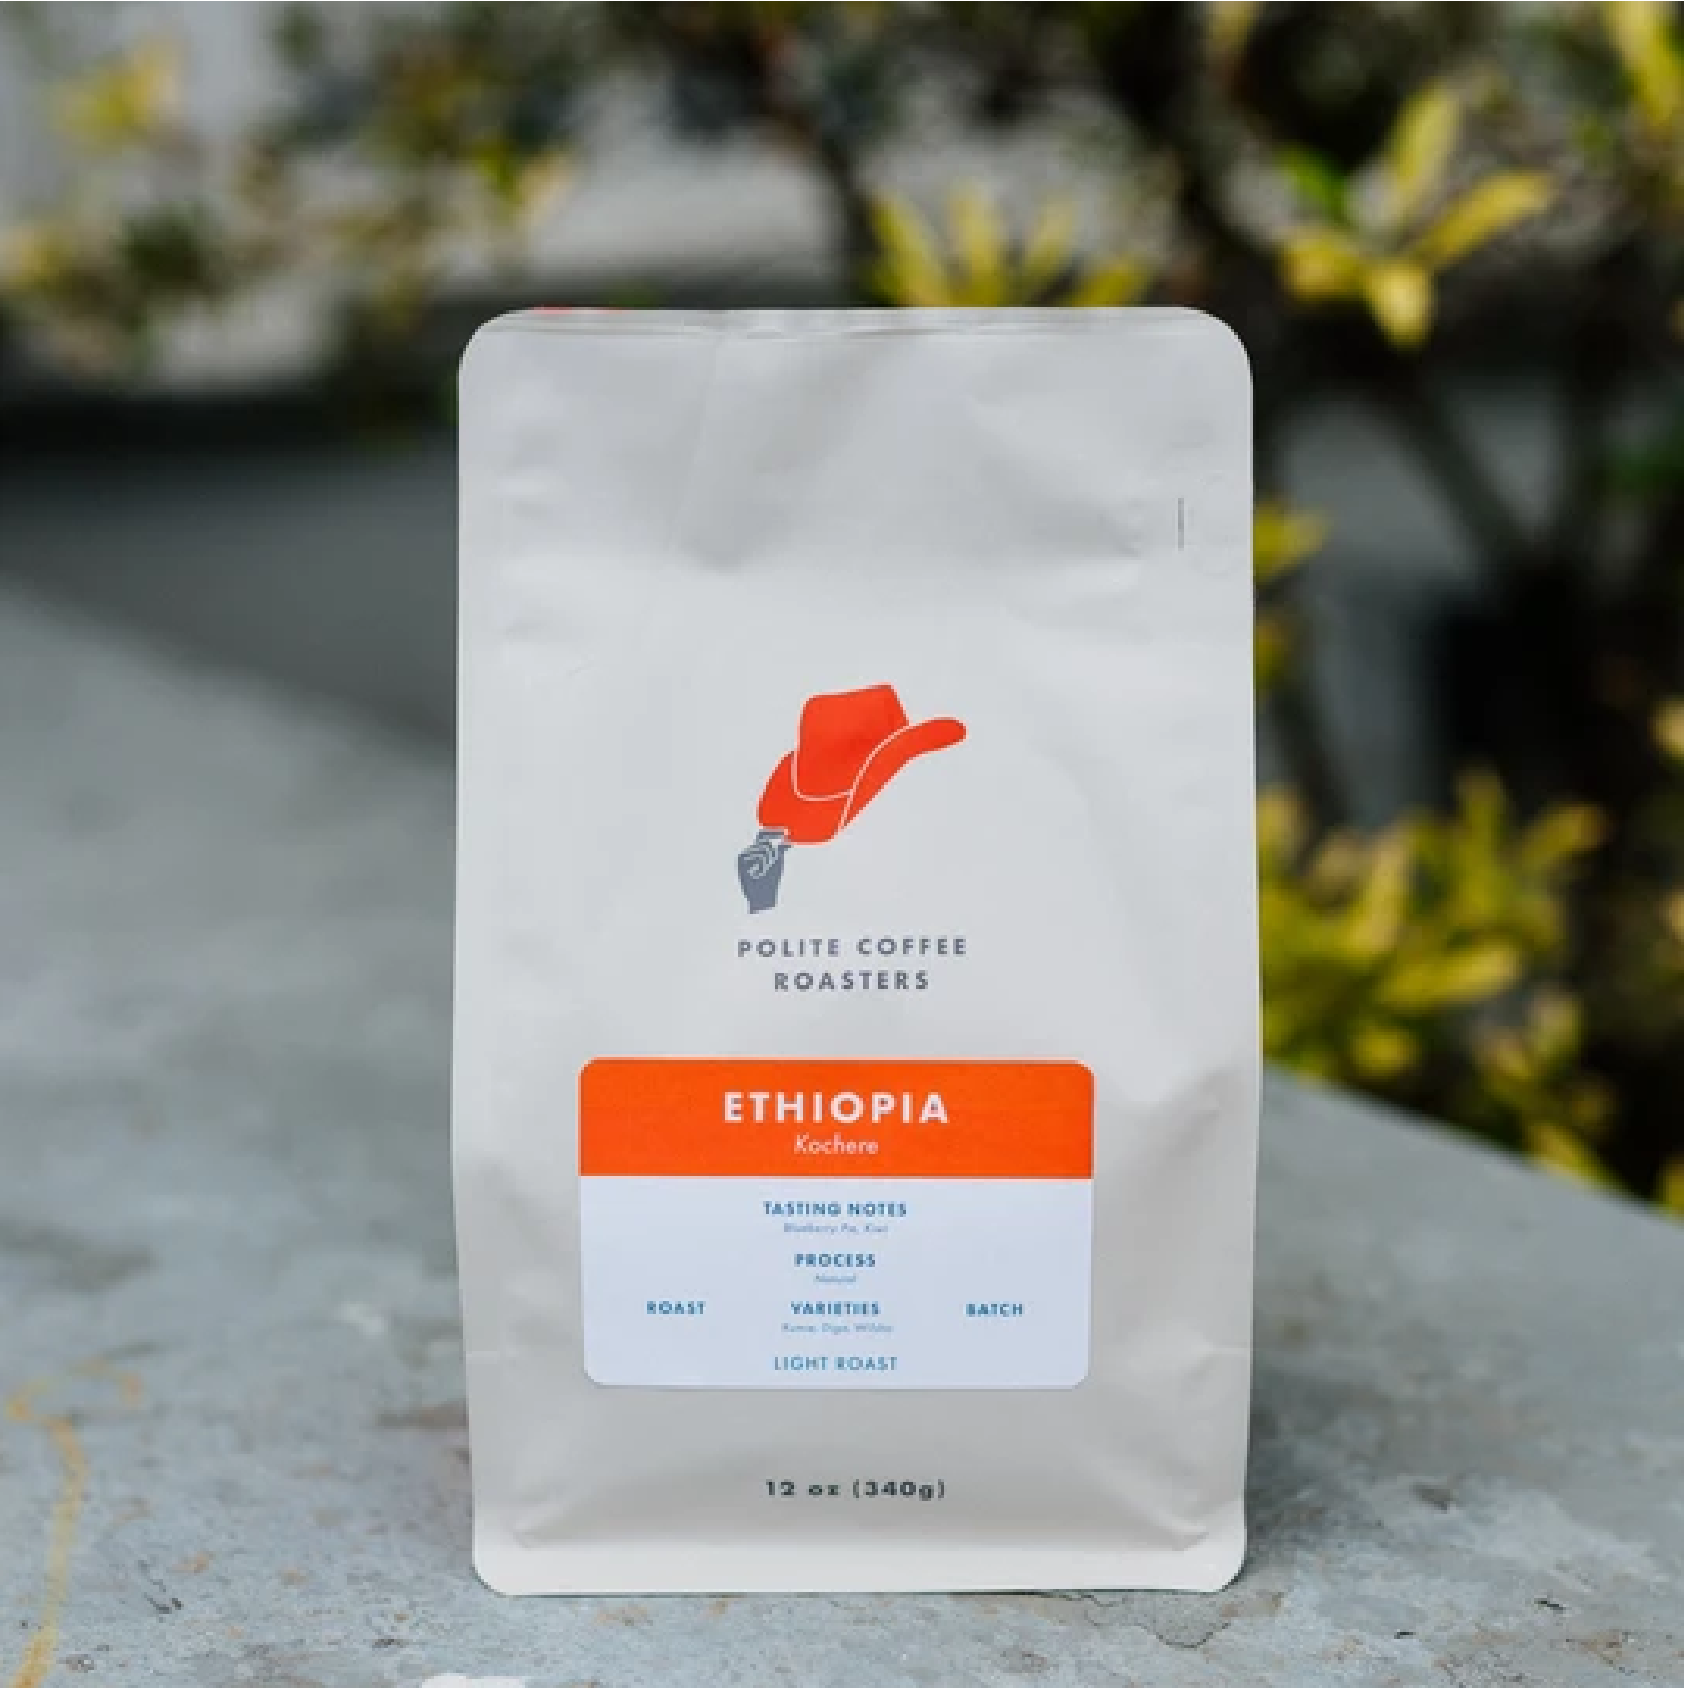 Ethiopia Kochere from Polite Coffee